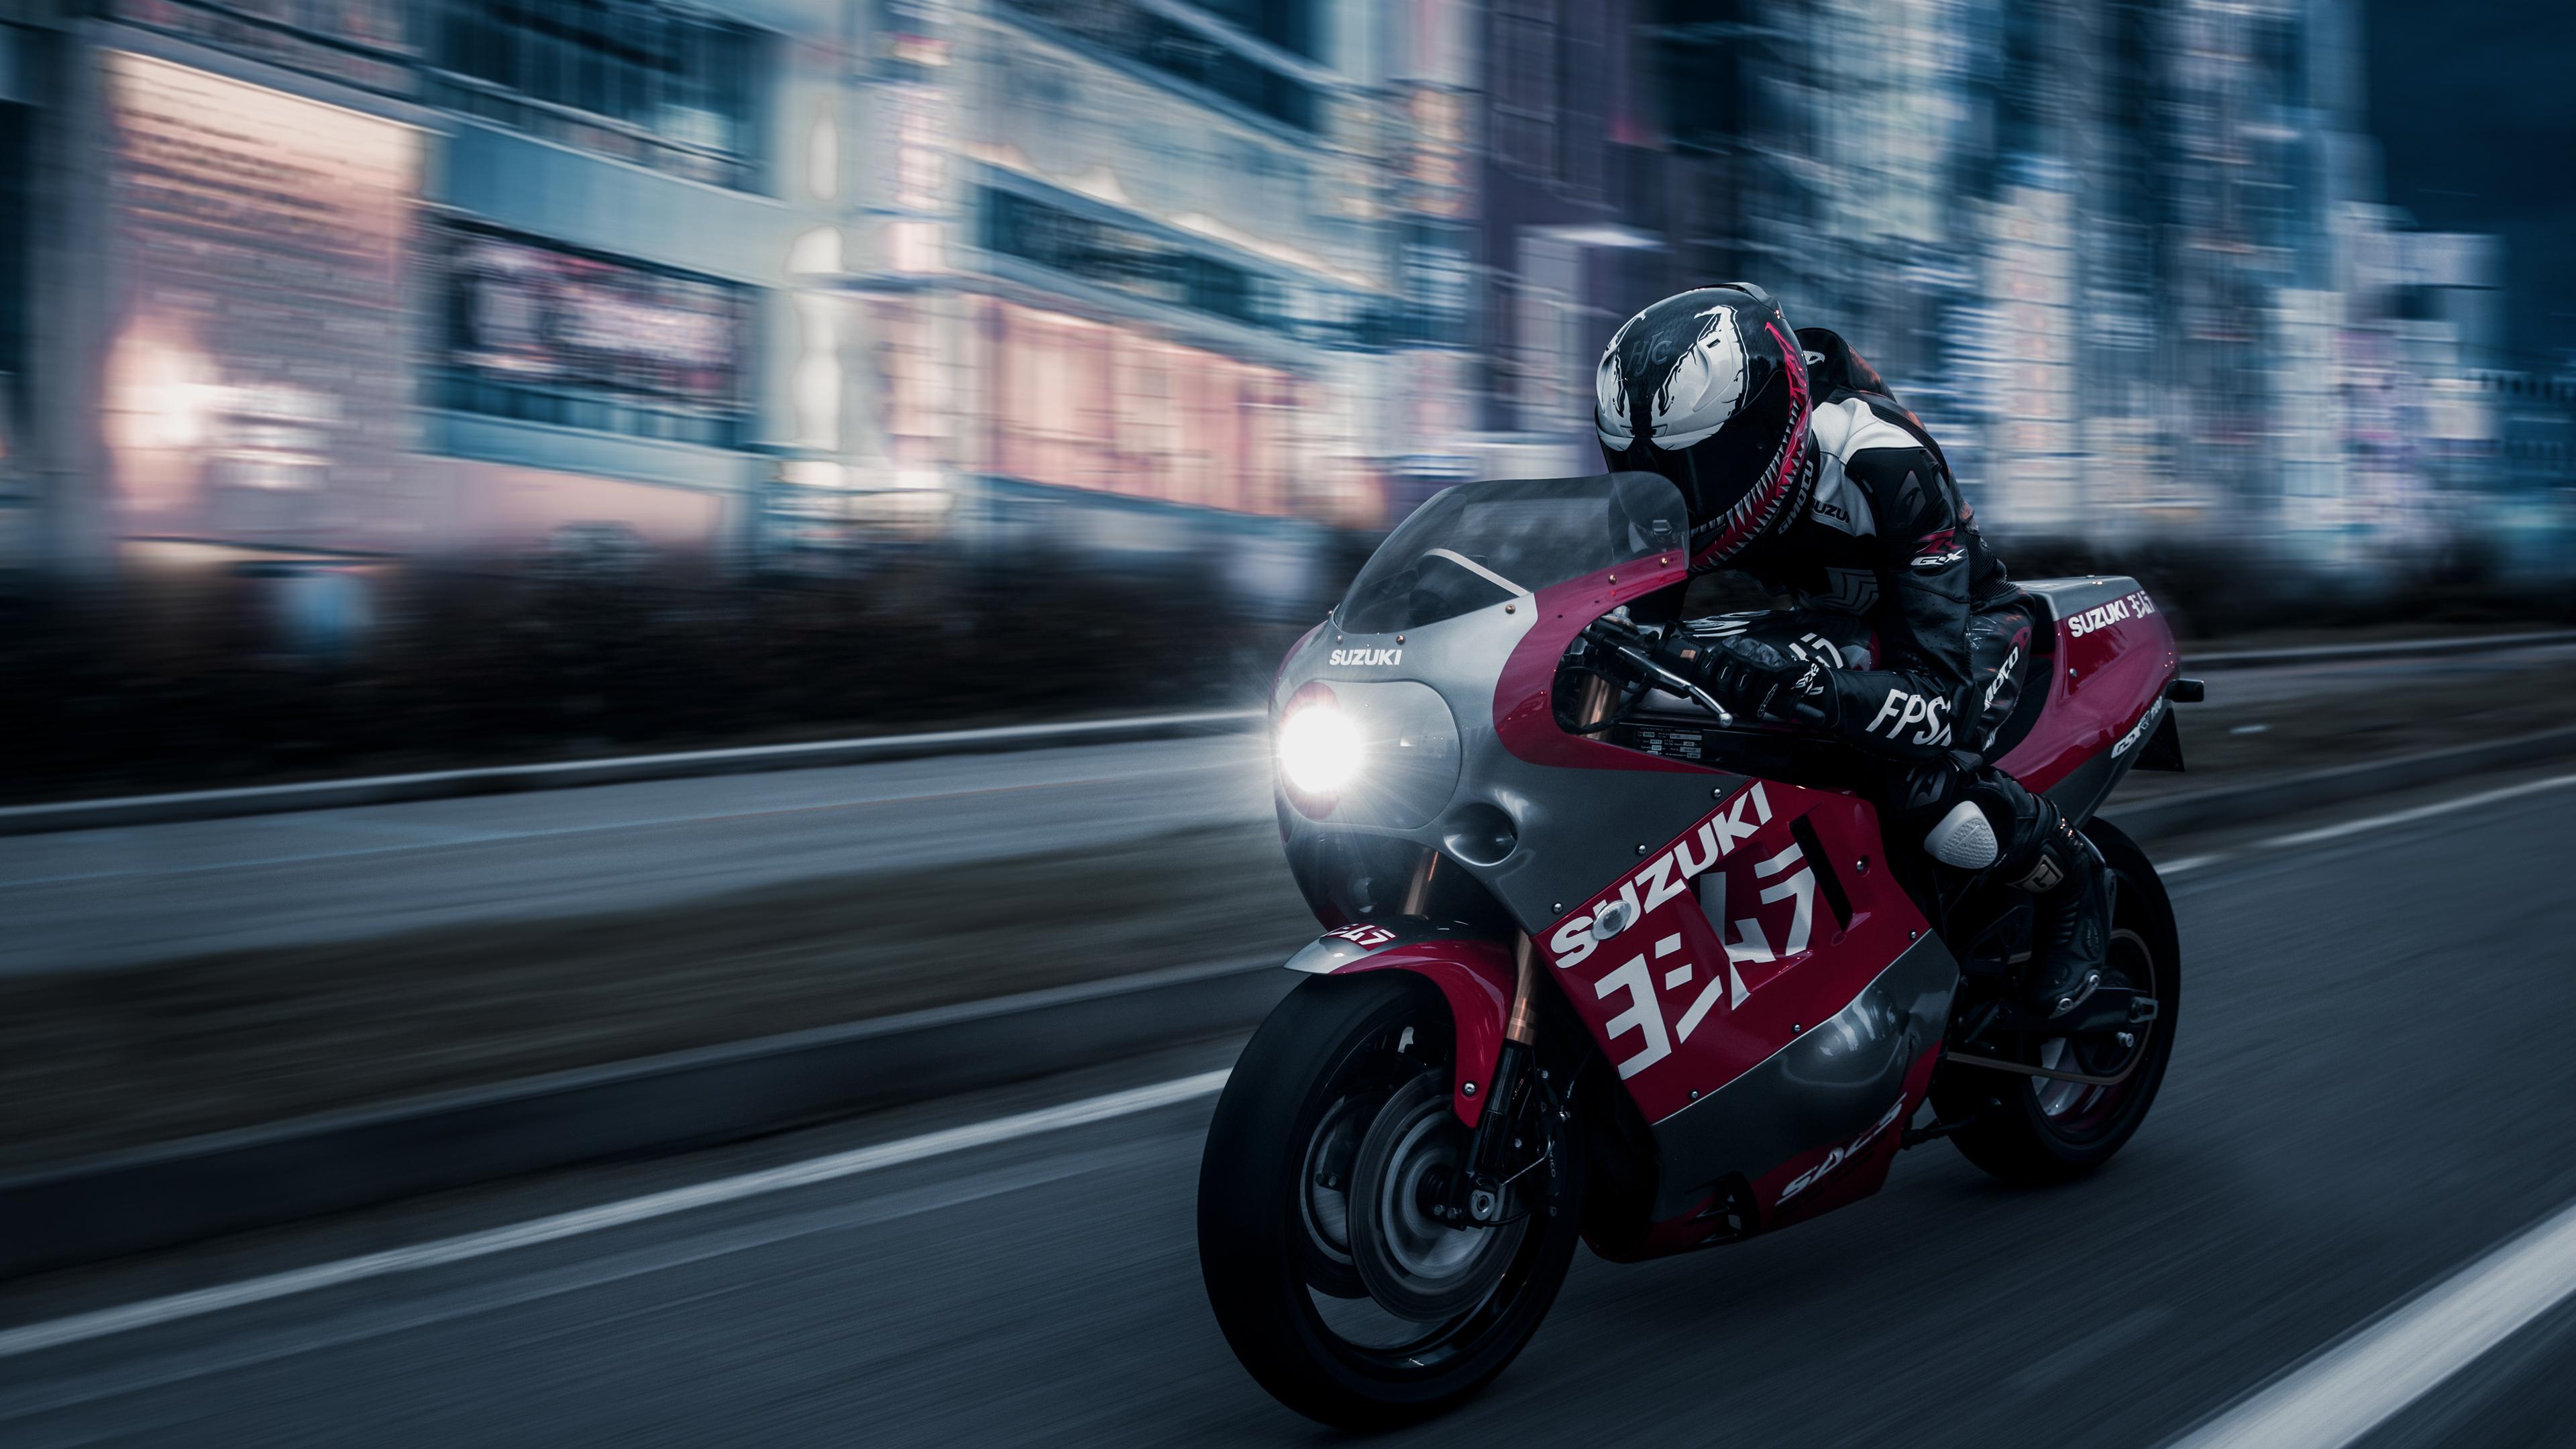 venom suzuki gsx r 1100 1536316571 - Venom Suzuki GSX R 1100 - Venom wallpapers, suzuki wallpapers, hd-wallpapers, bikes wallpapers, behance wallpapers, artist wallpapers, 4k-wallpapers